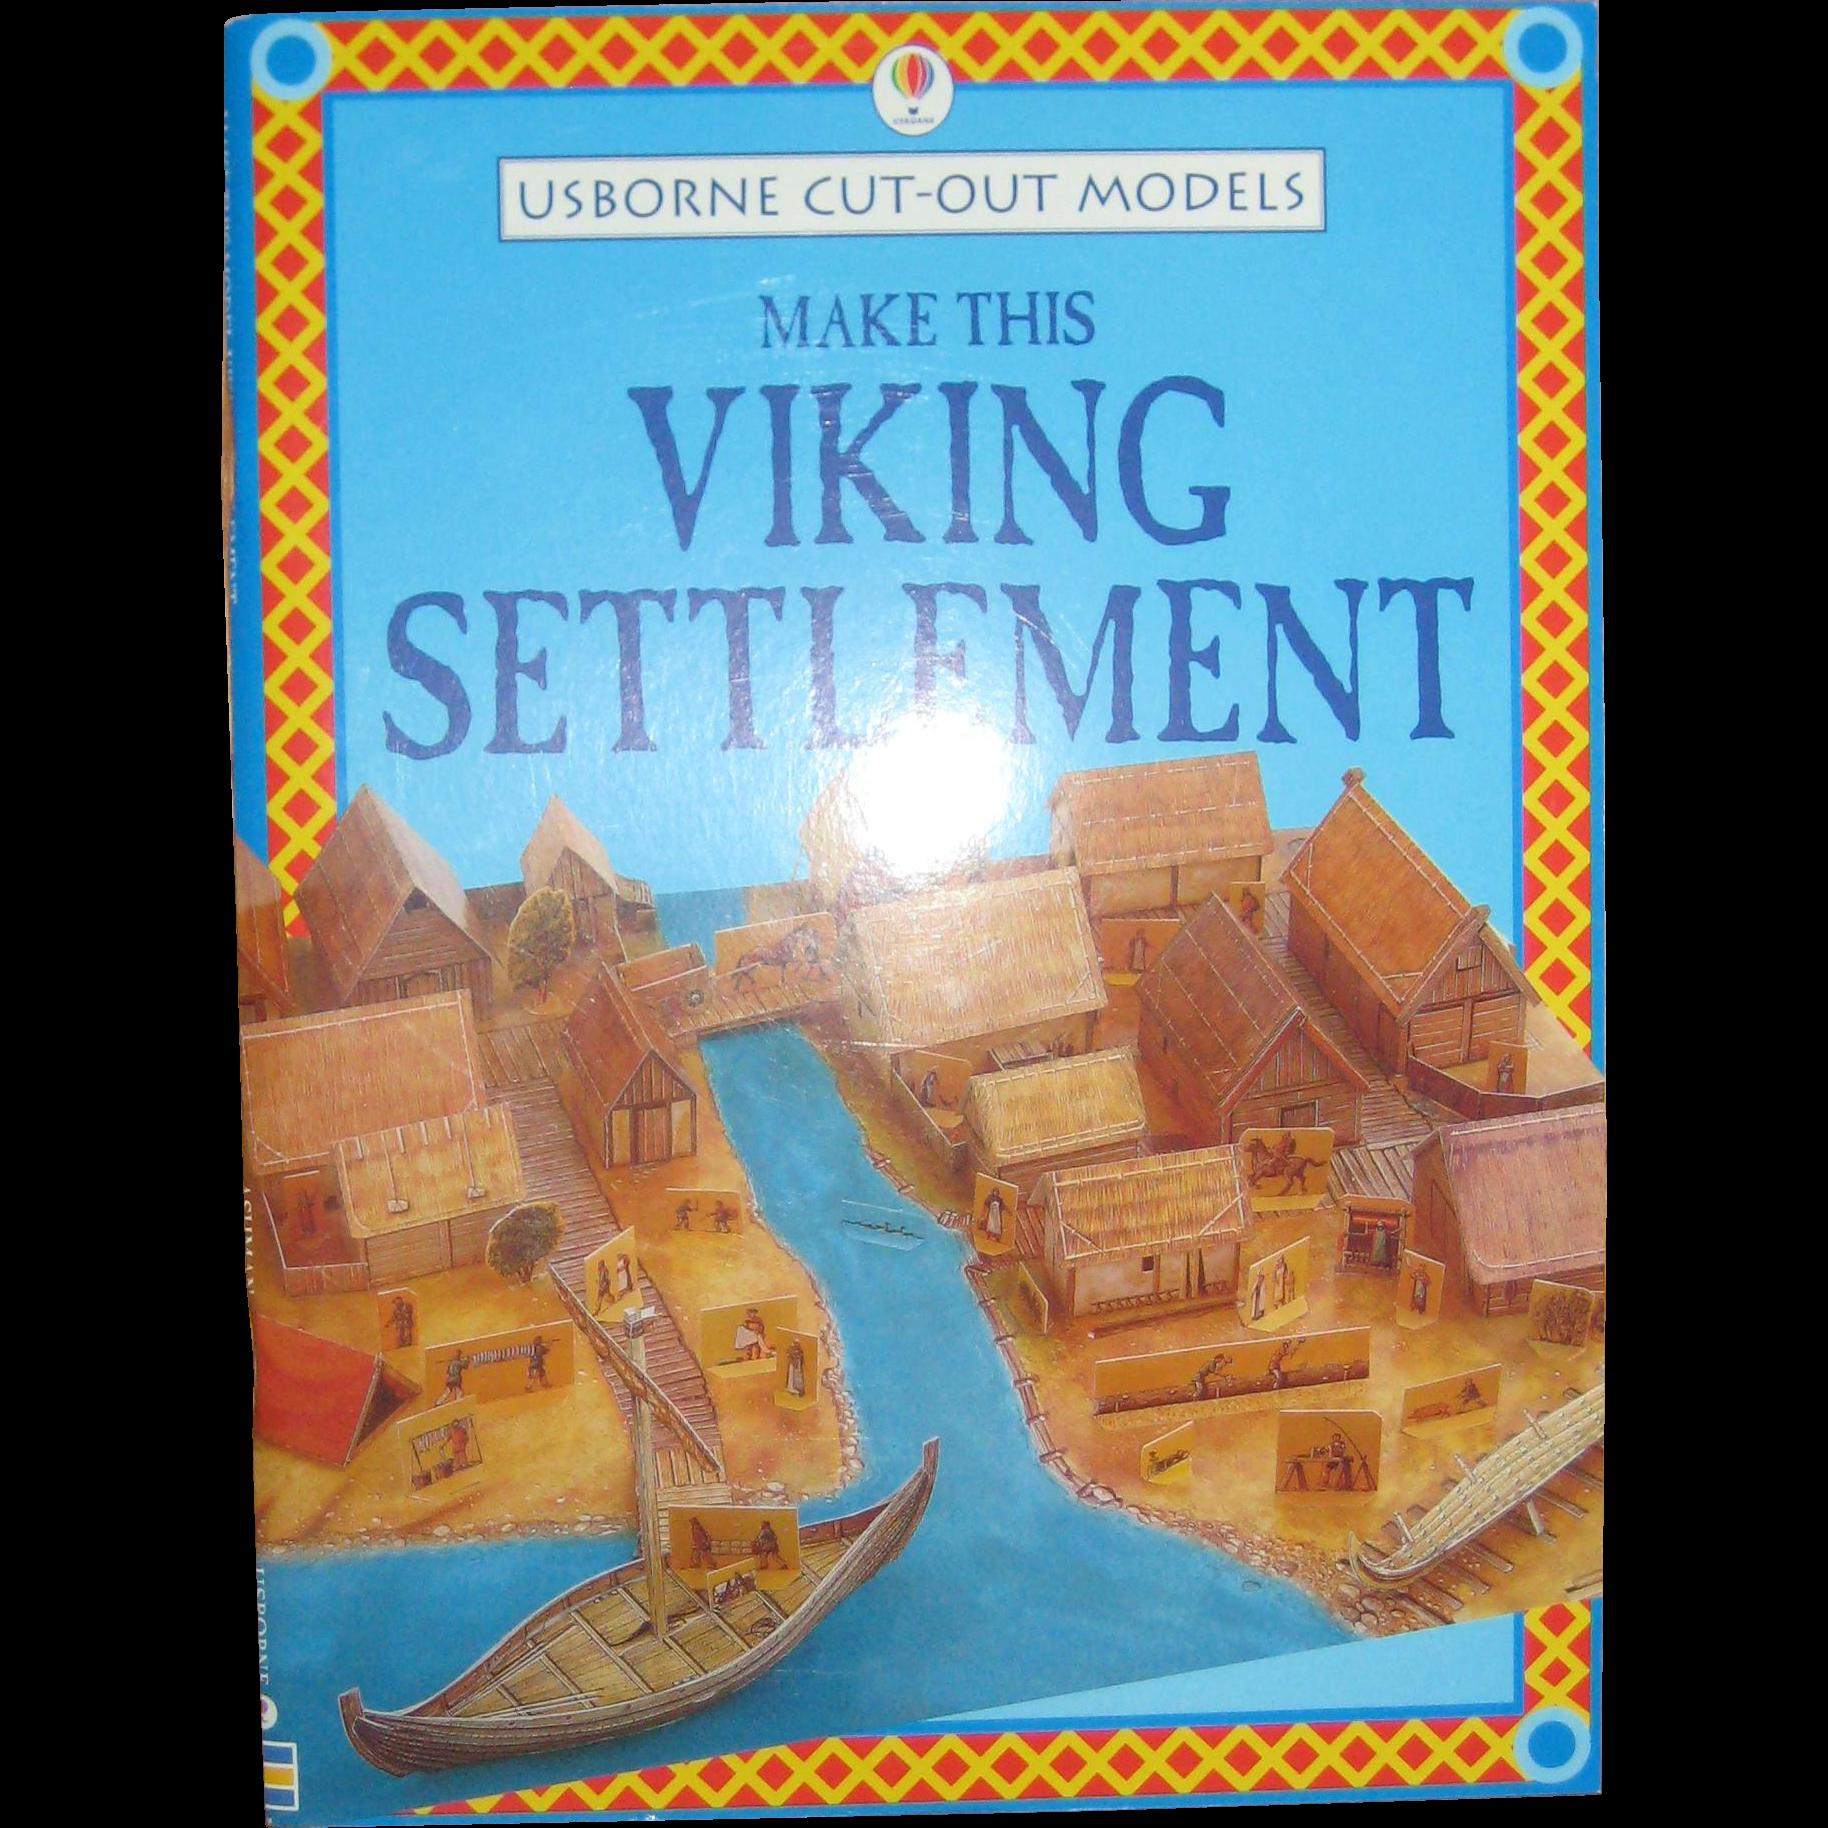 Make This Viking Settlement - An Usborne Cut-out Book